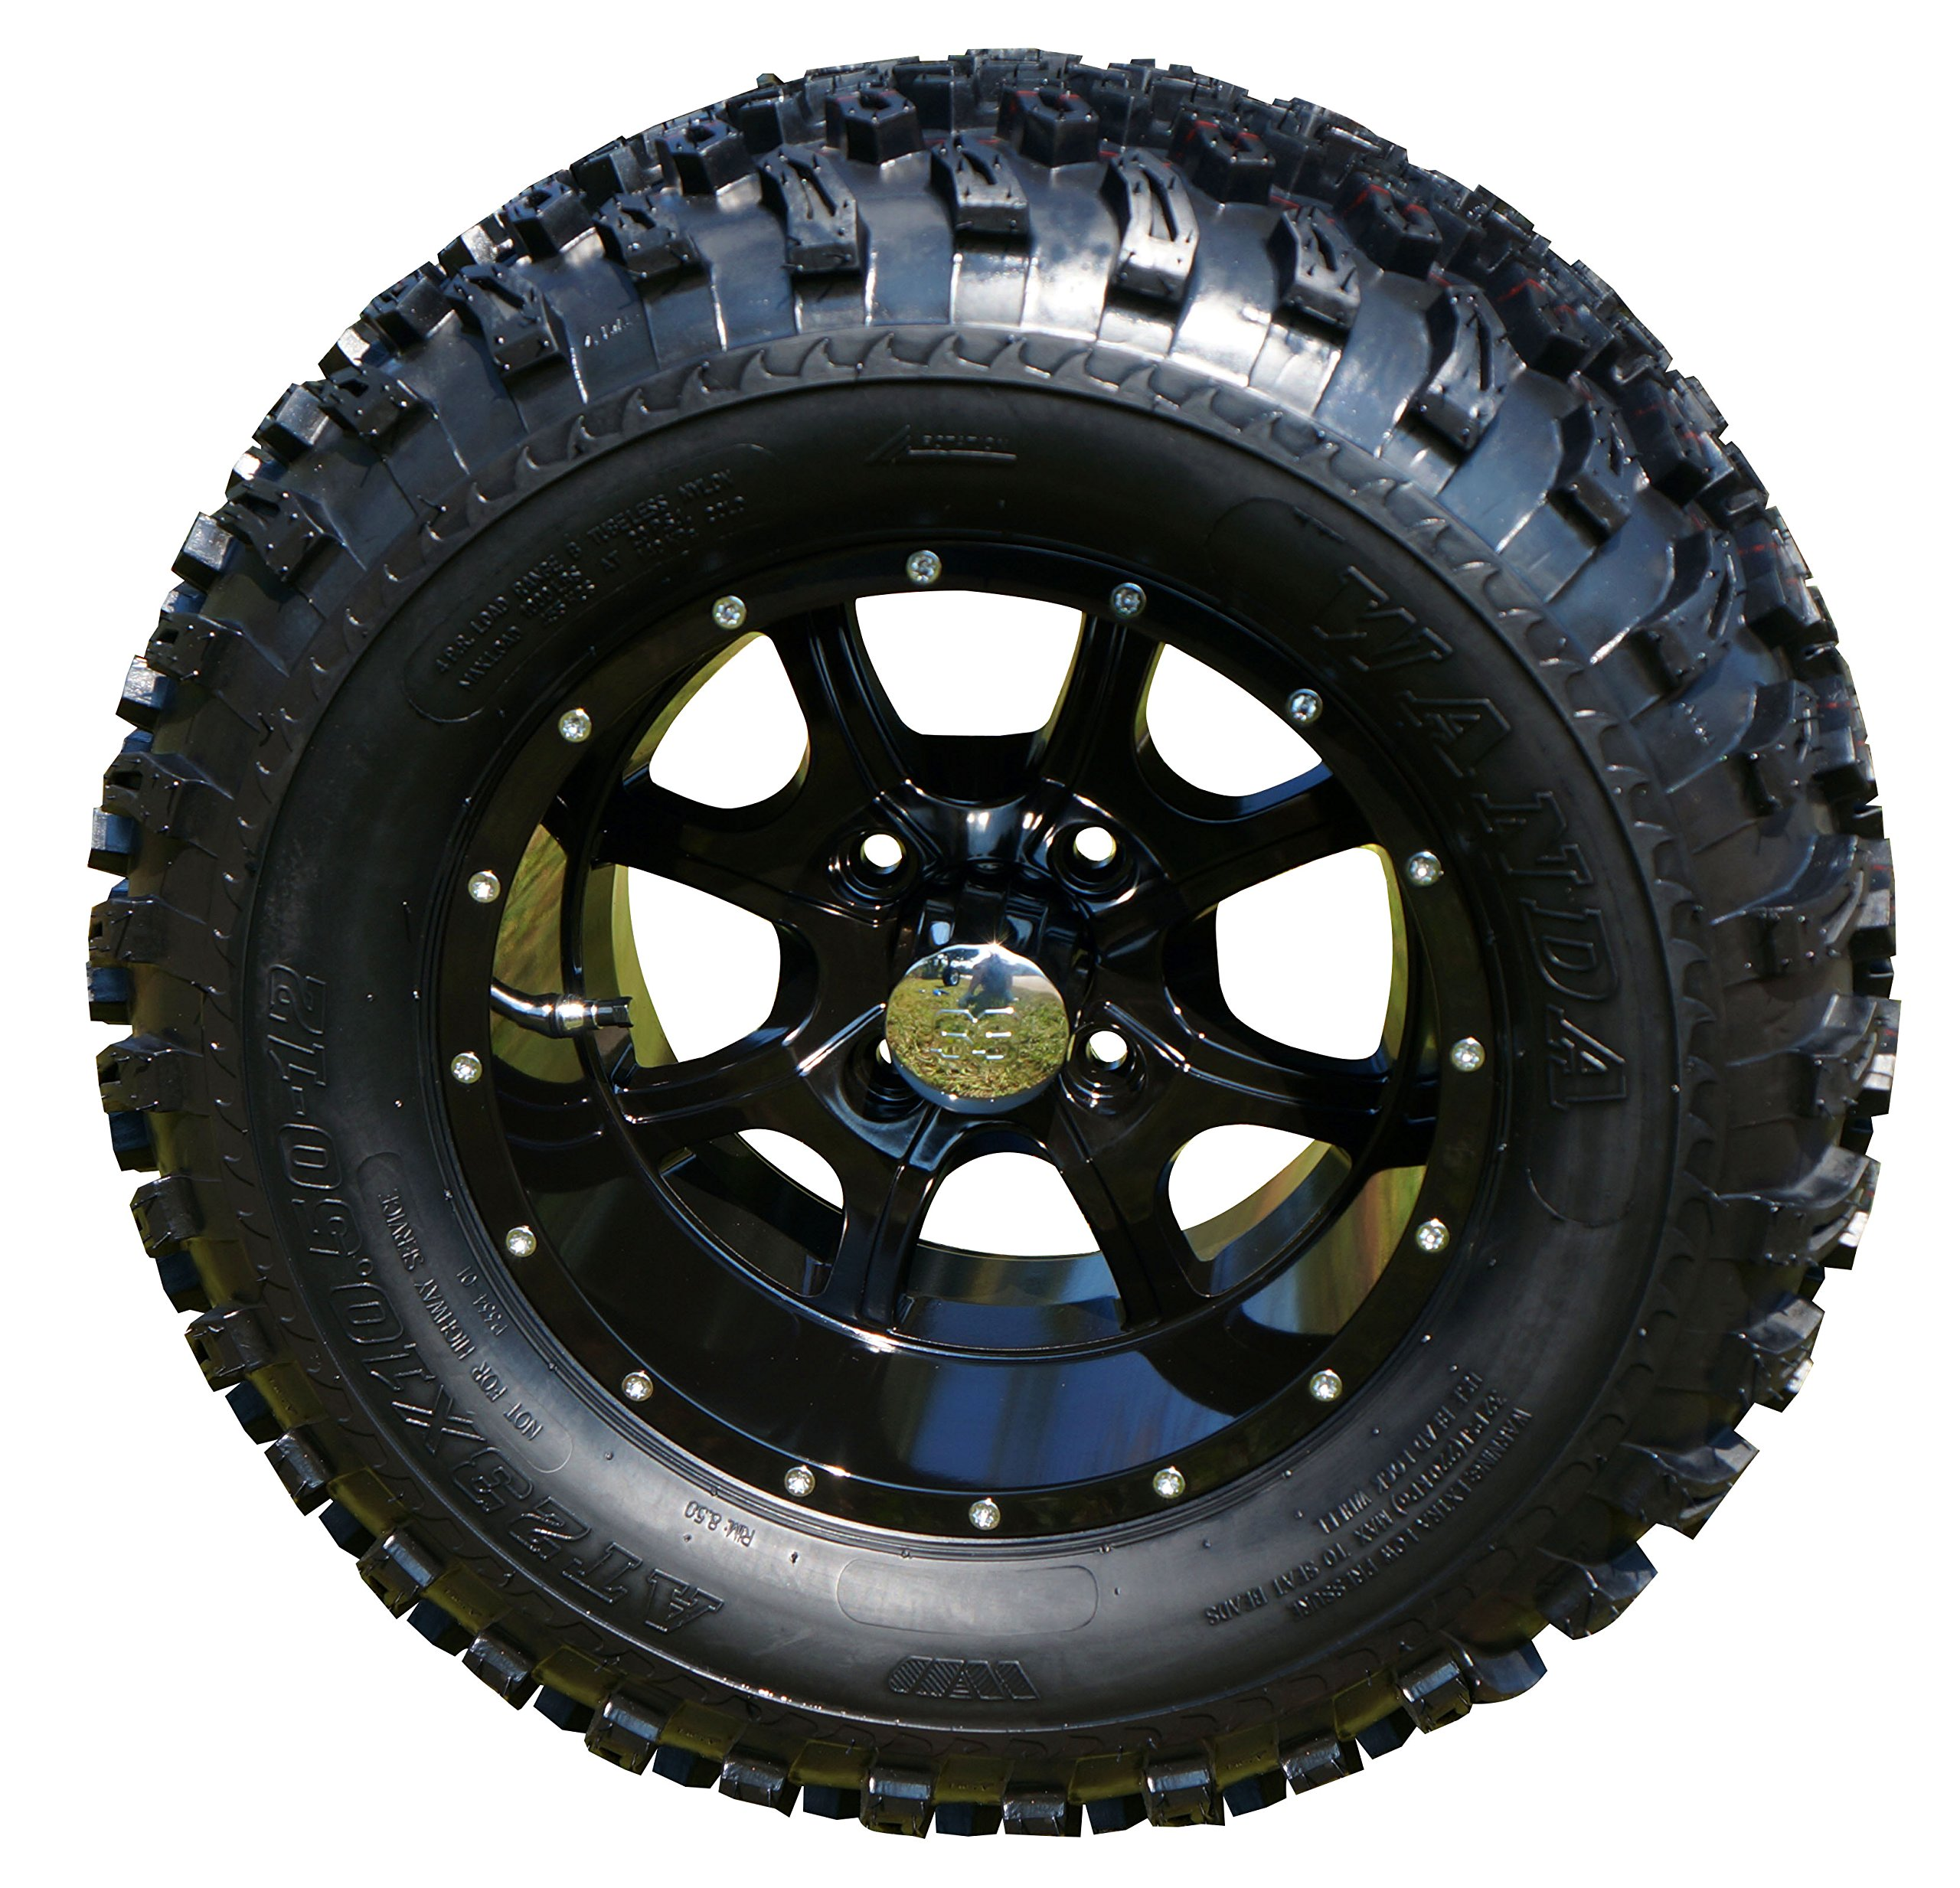 12'' Night Stalker Black Golf Cart Wheels with 23'' All Terrain Tires - Set of 4